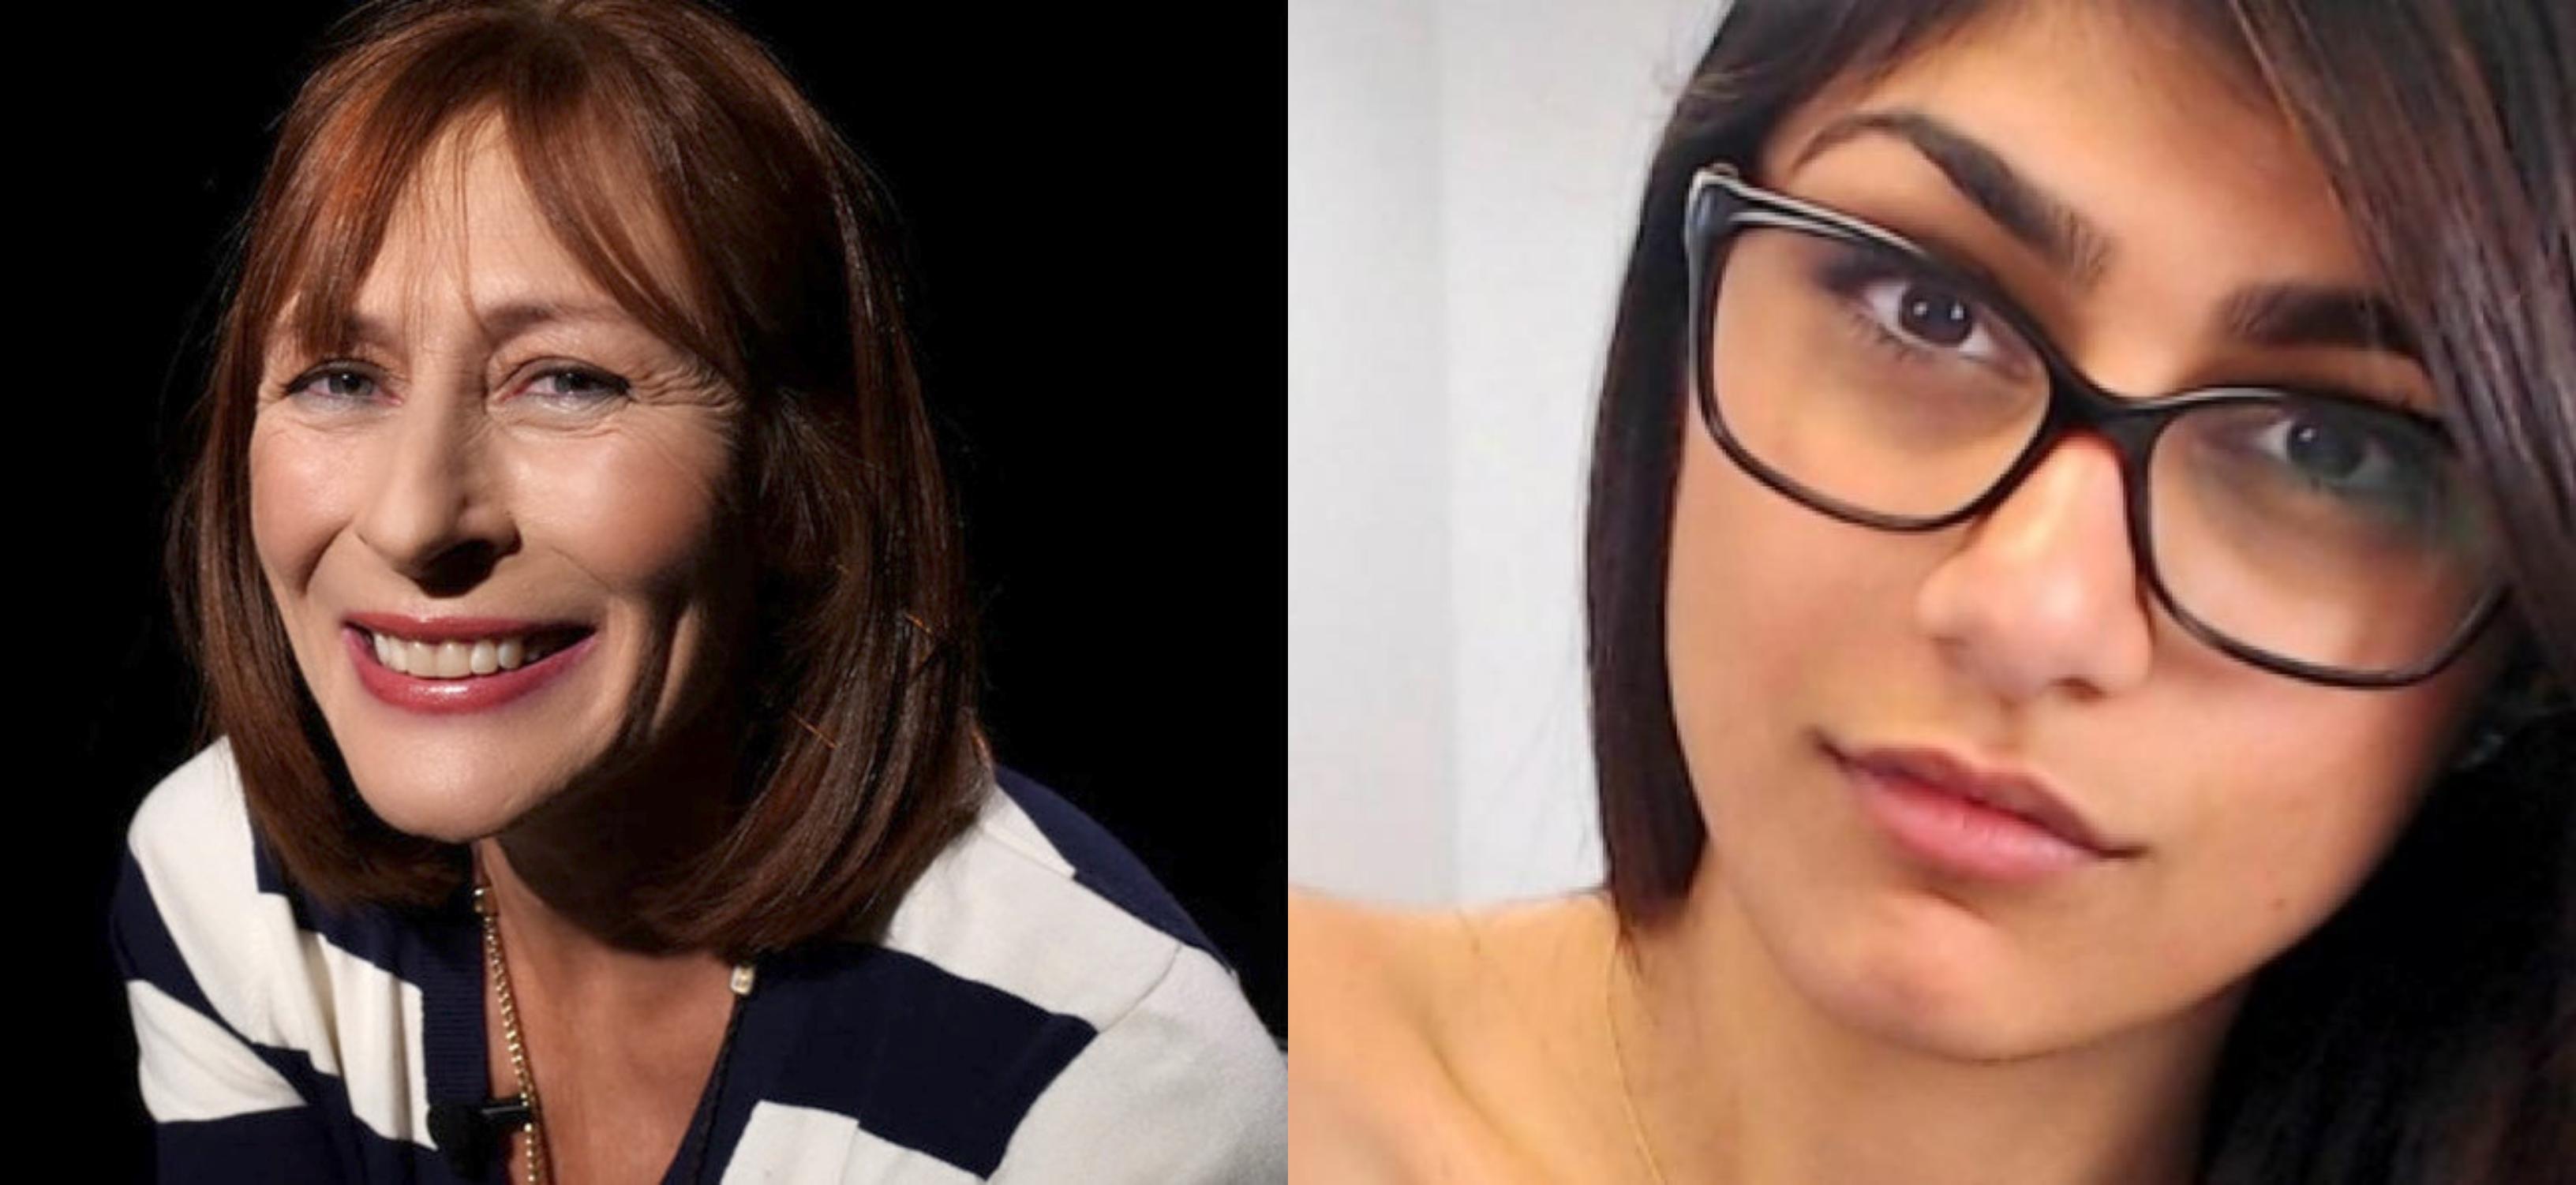 Actrices Pornos Suizas clouthier confunde a ex actriz porno con estudiante